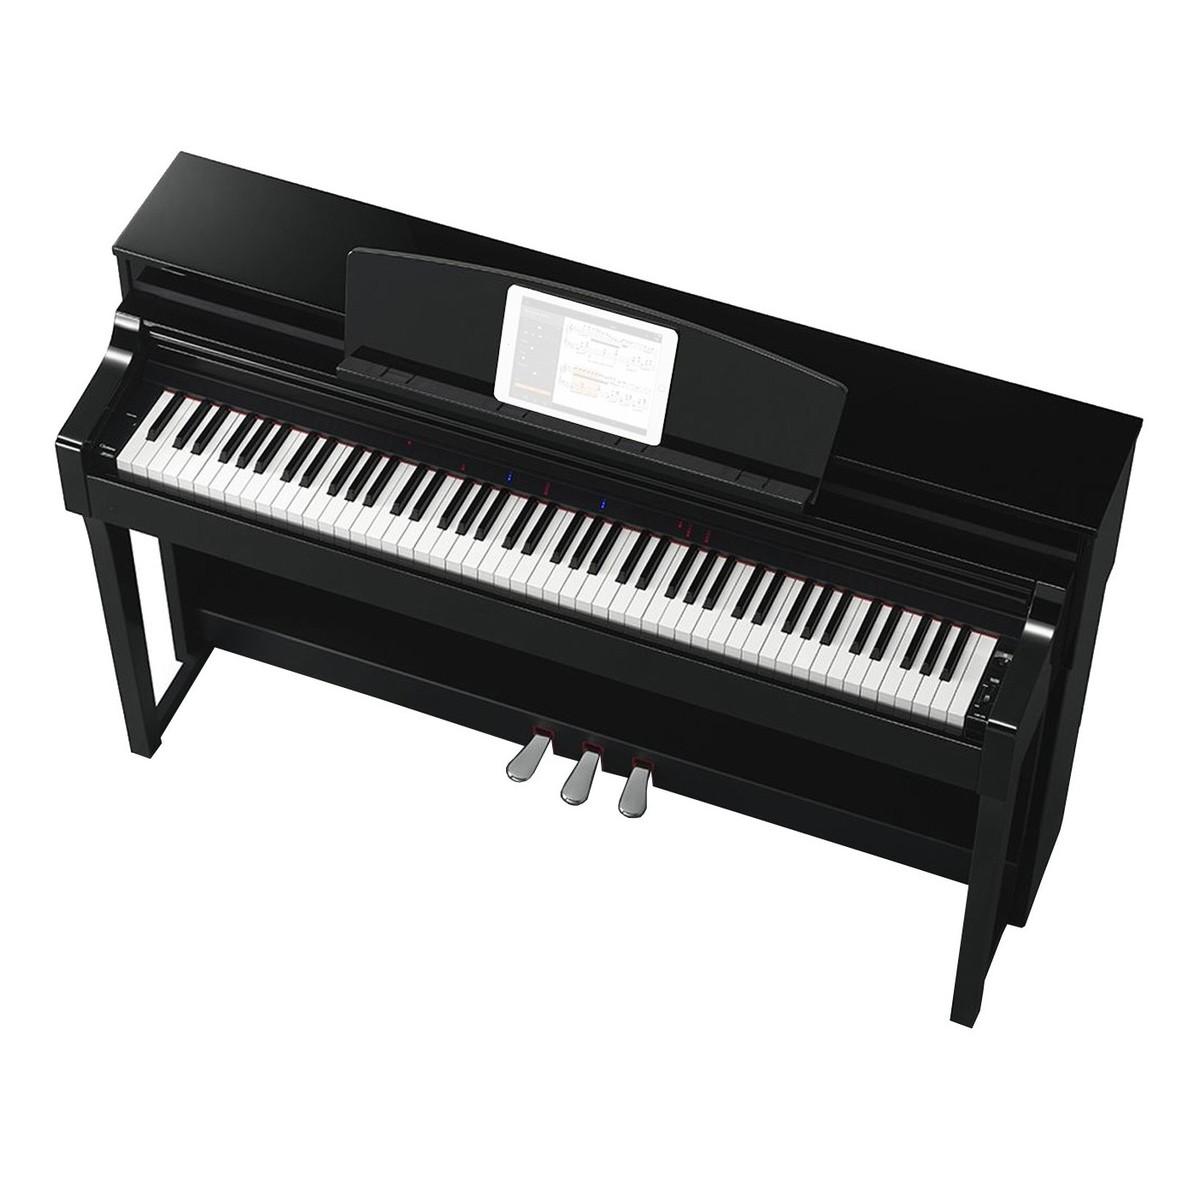 Yamaha clavinova csp 170 digital piano polished ebony at for Yamaha digital piano clavinova